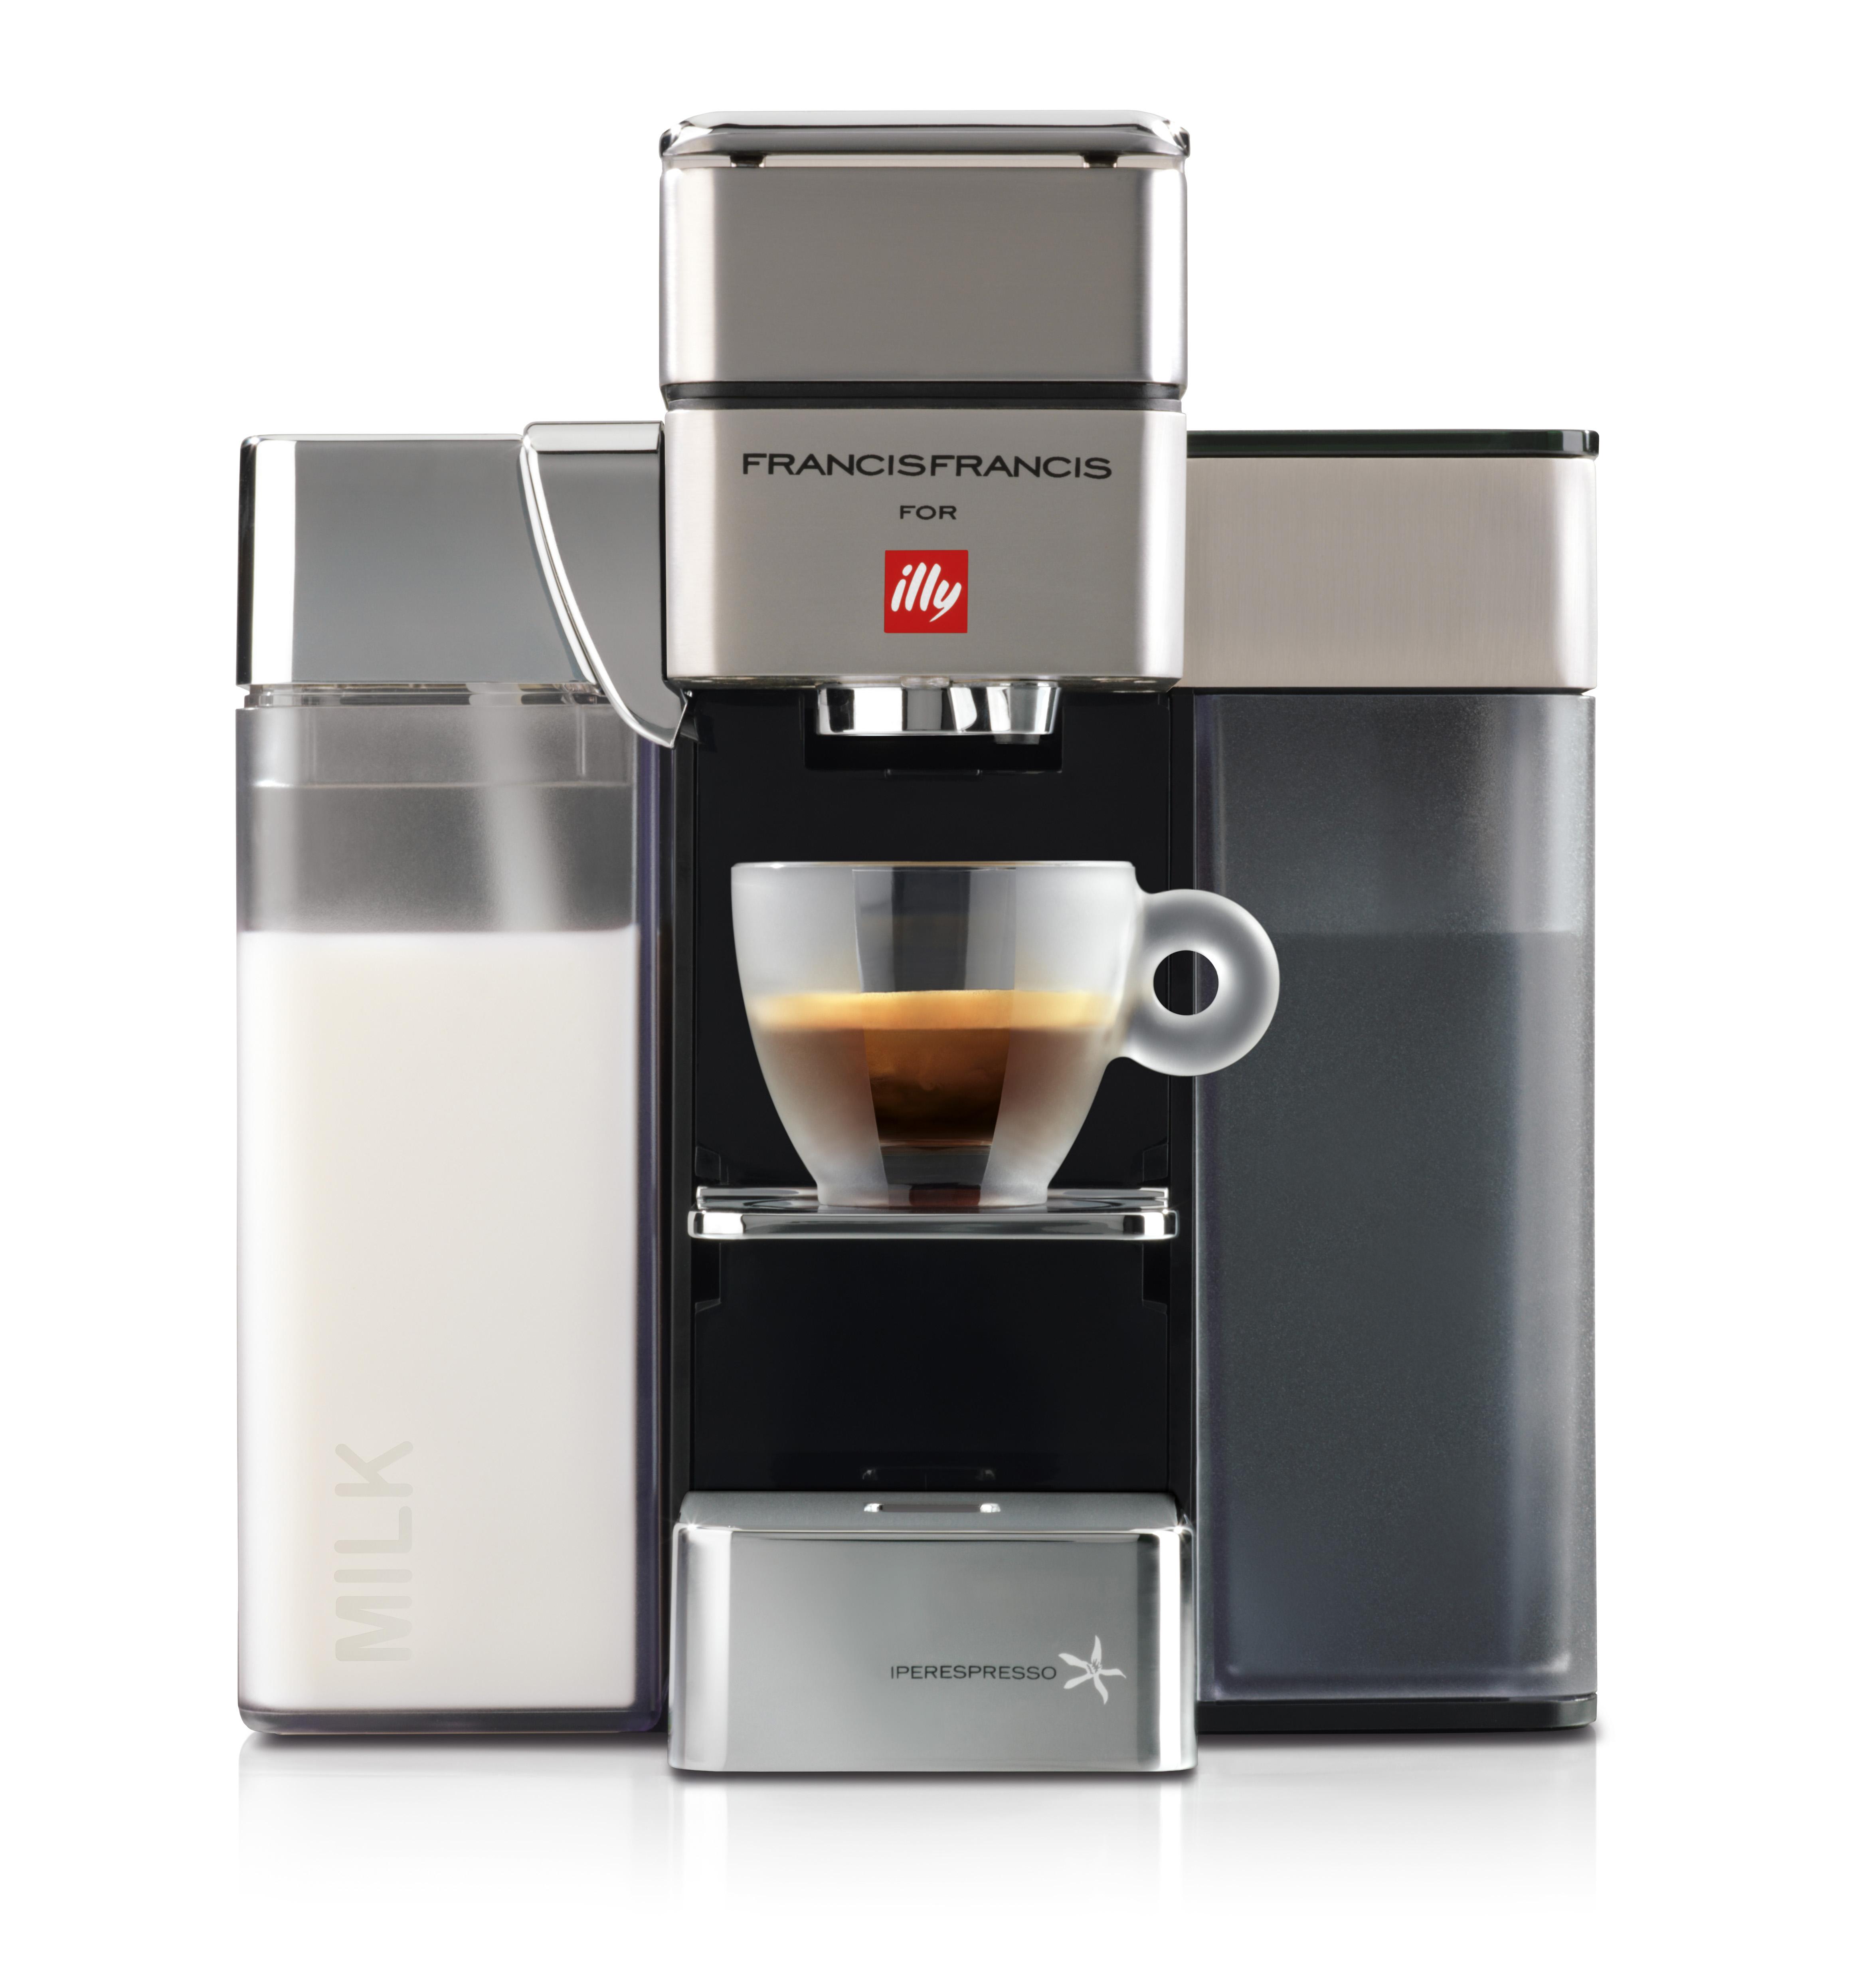 Amps Of Coffee Maker : illy Francis Francis Y5 Milk, Espresso & Coffee Machine